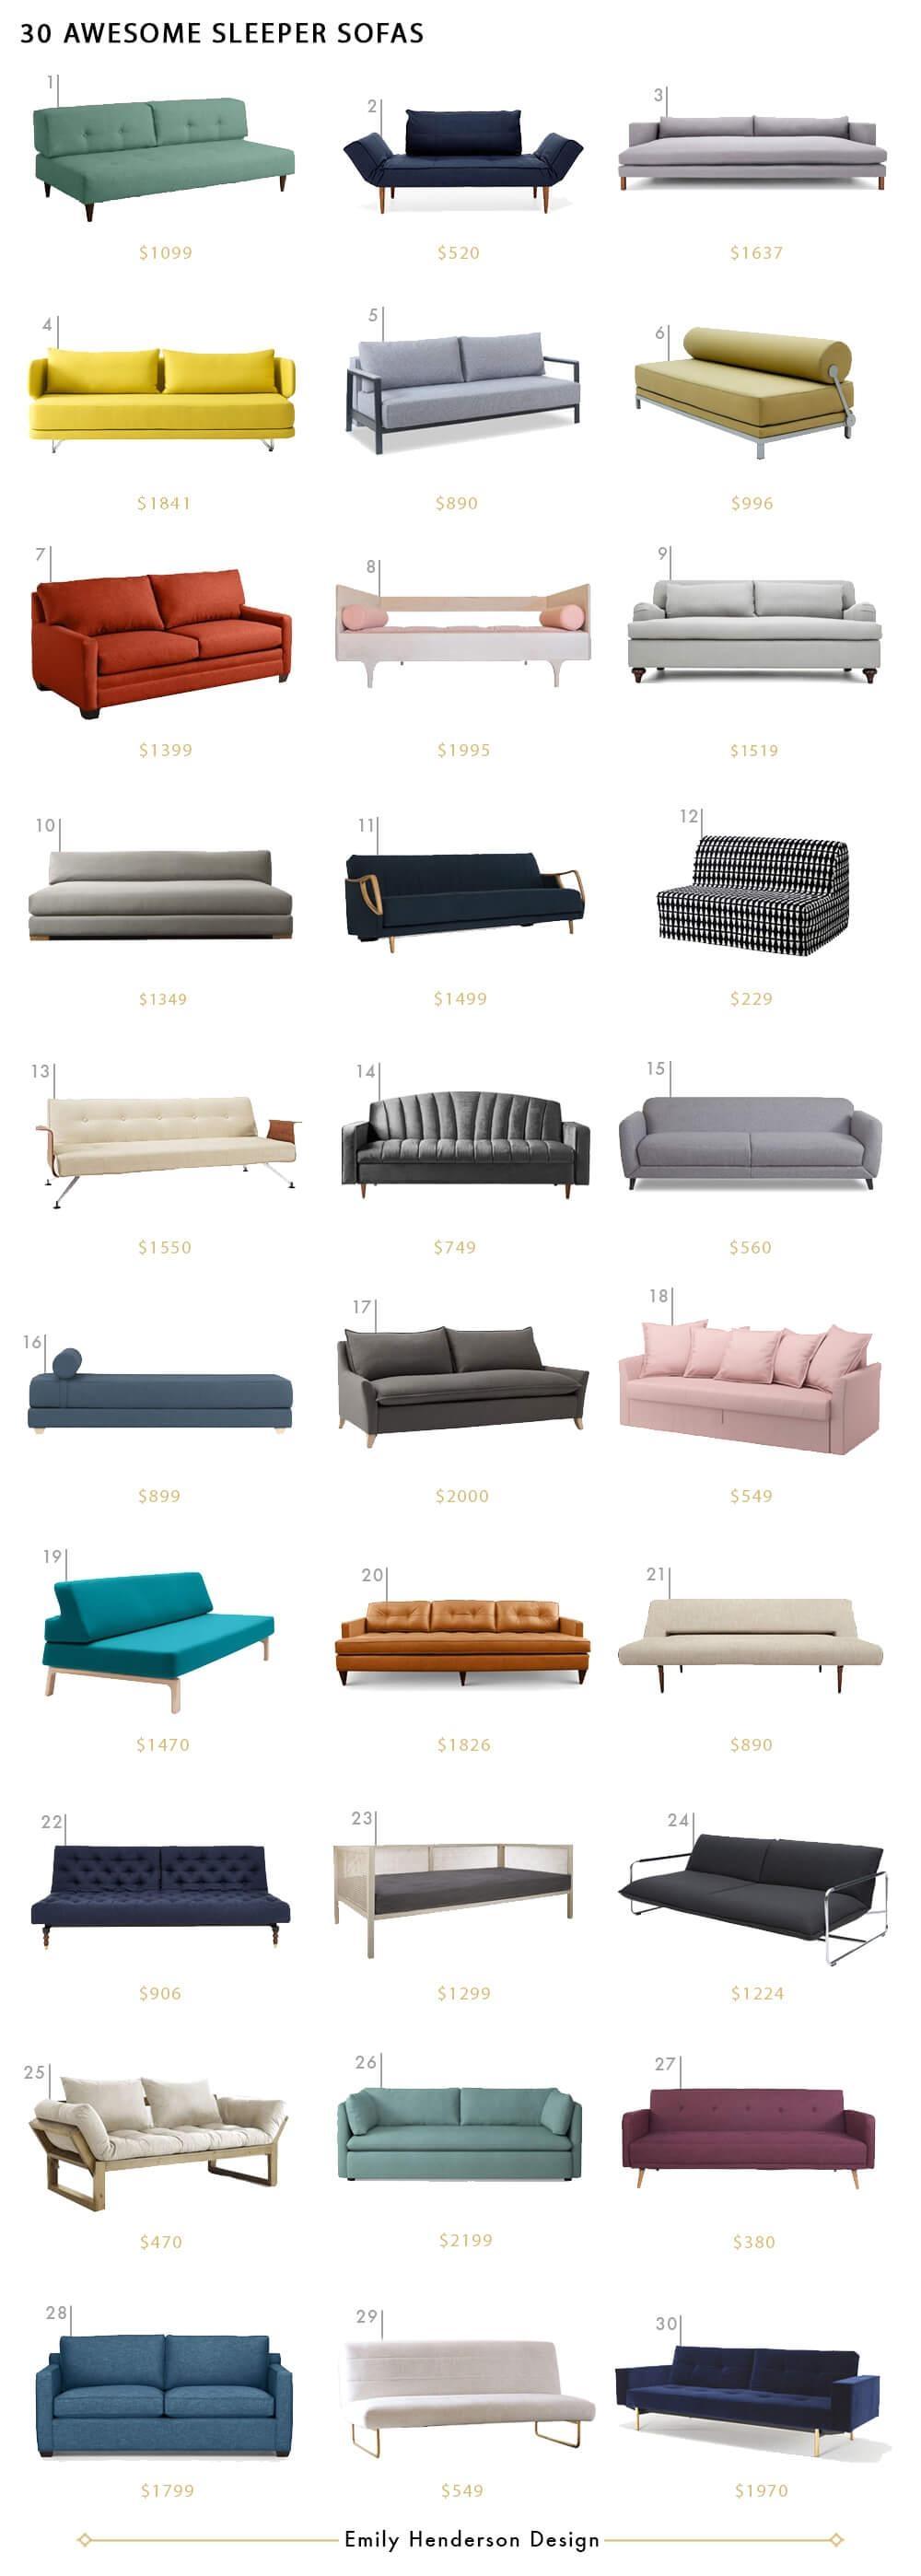 30 Sleeper Sofas We Love - Emily Henderson throughout Everyday Sleeper Sofas